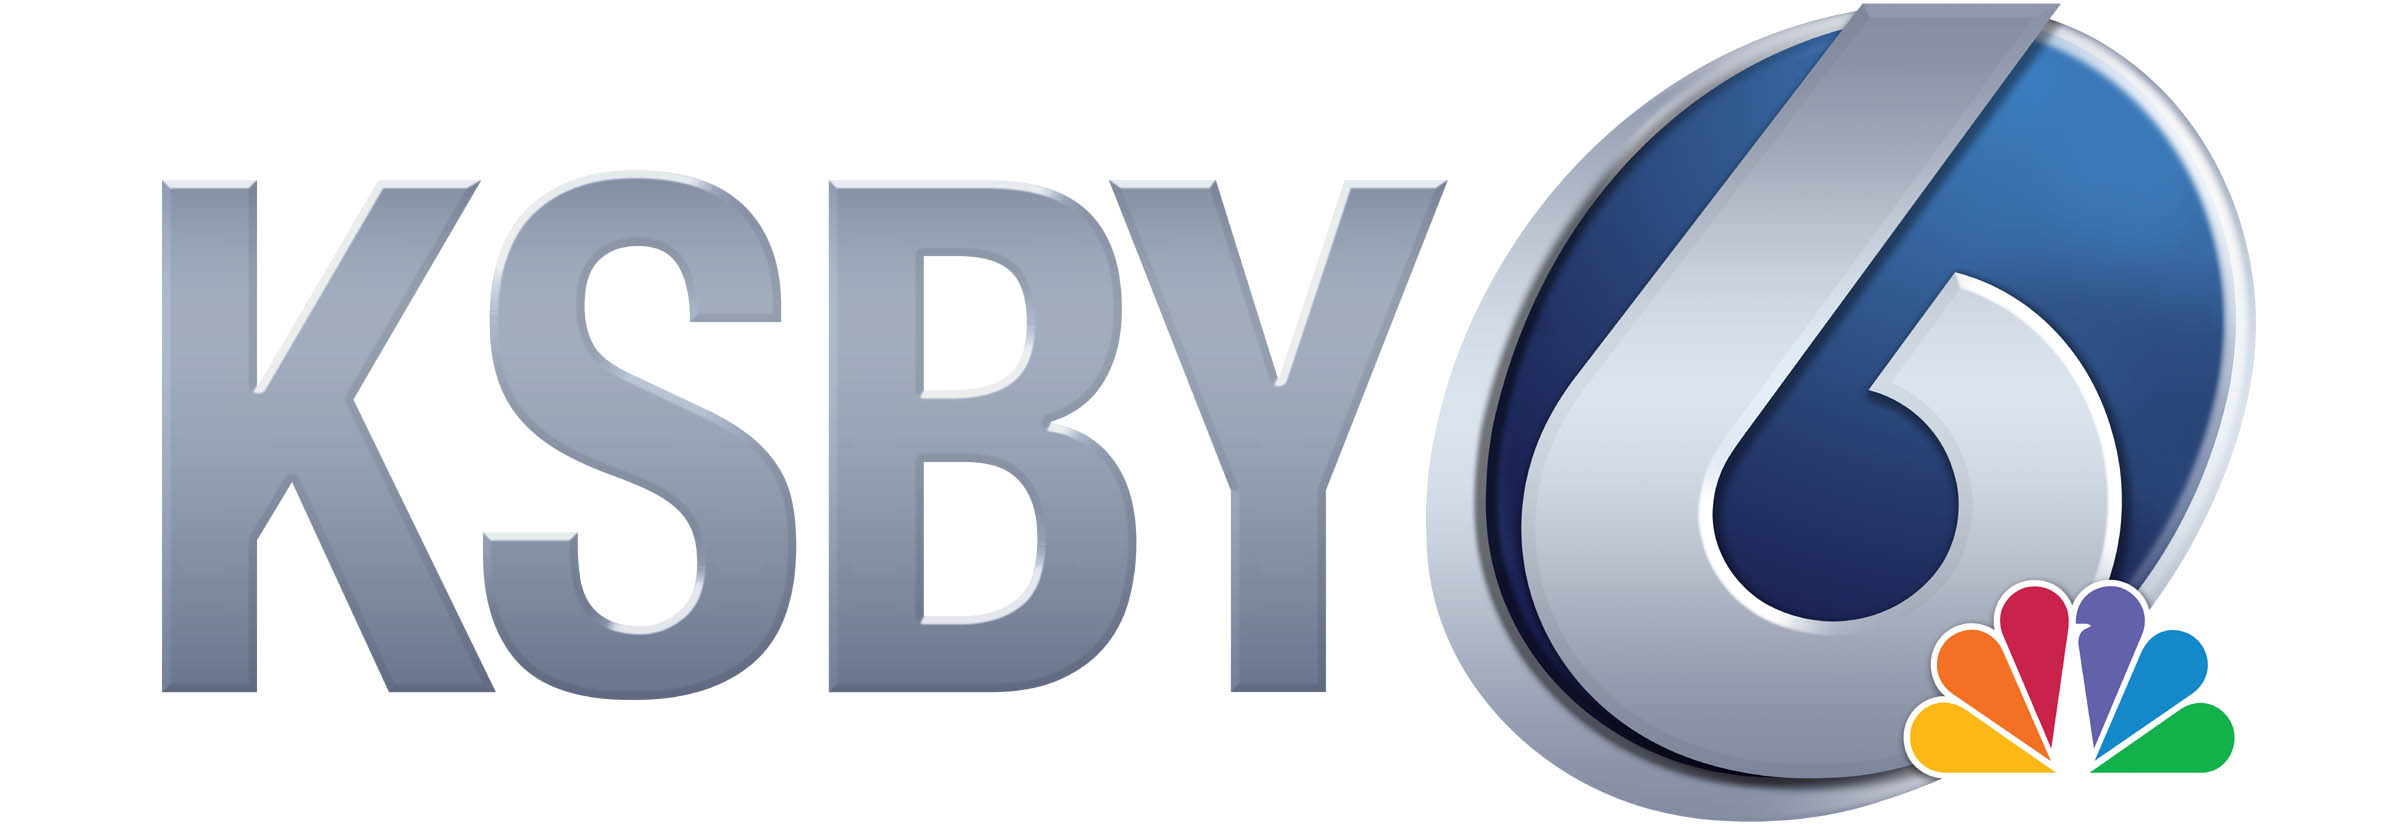 KSBY-logo